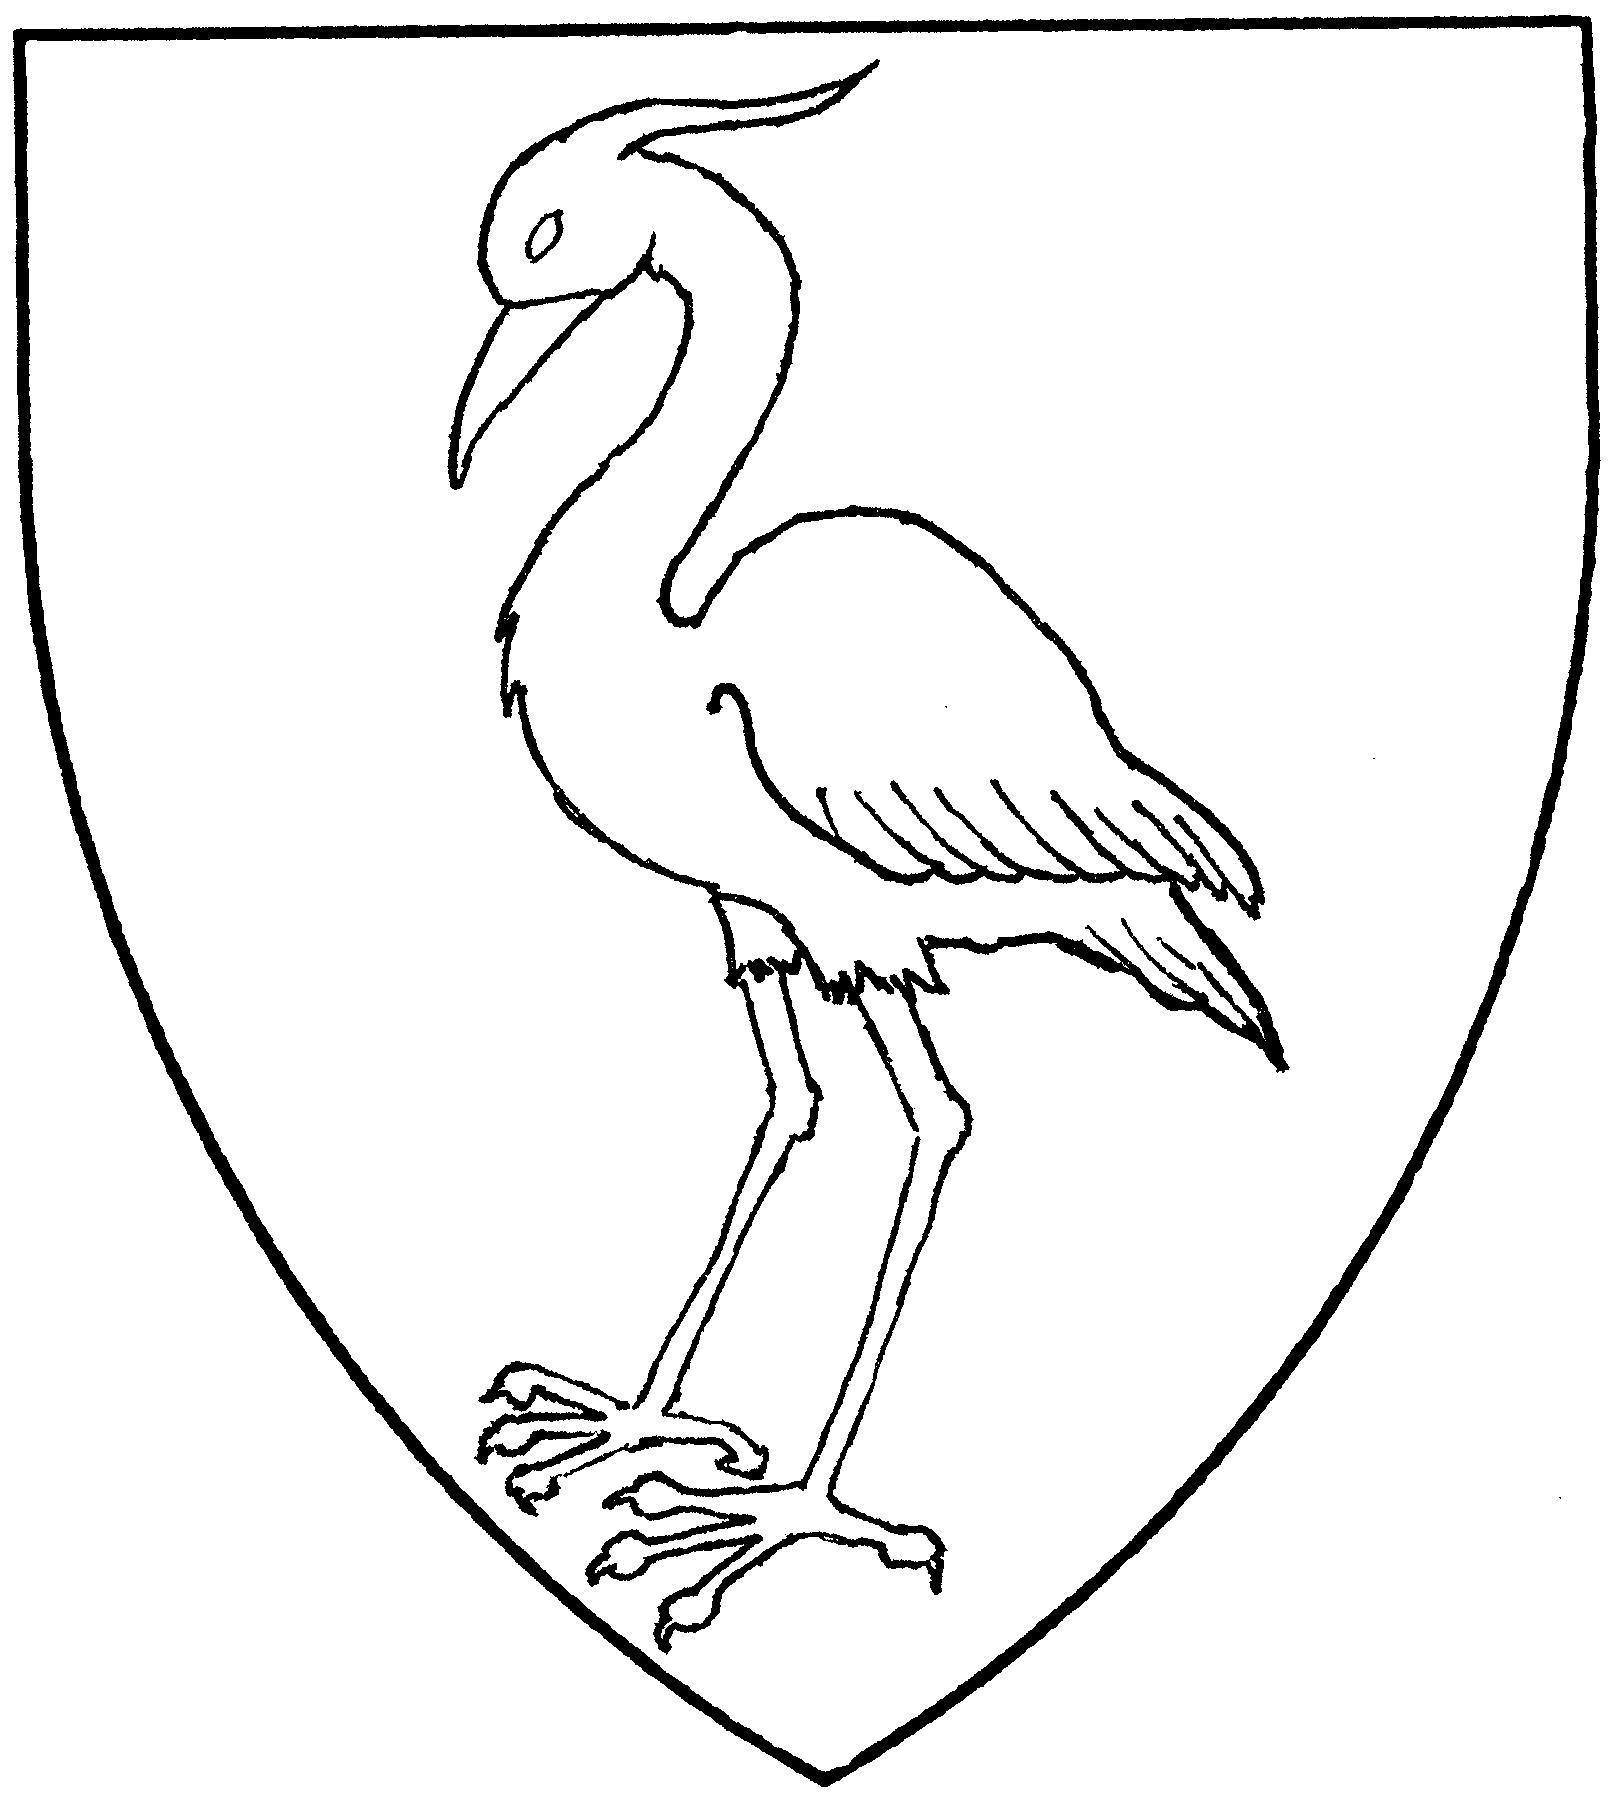 Heron (period)